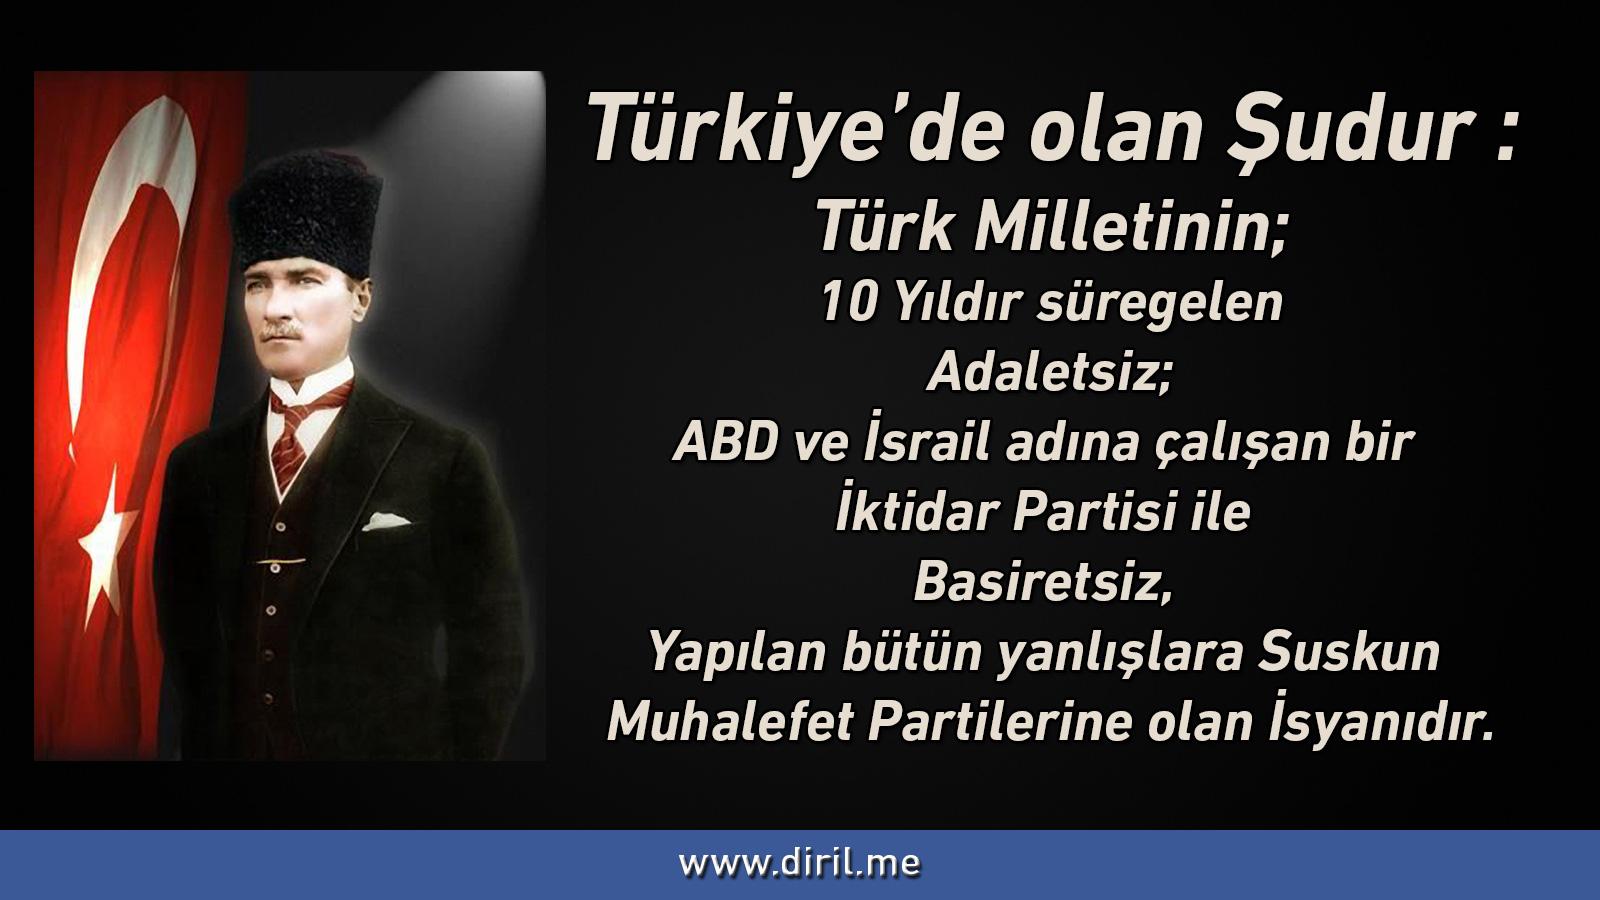 2013-06-04_TürkMilletiDevralır1_1600x900